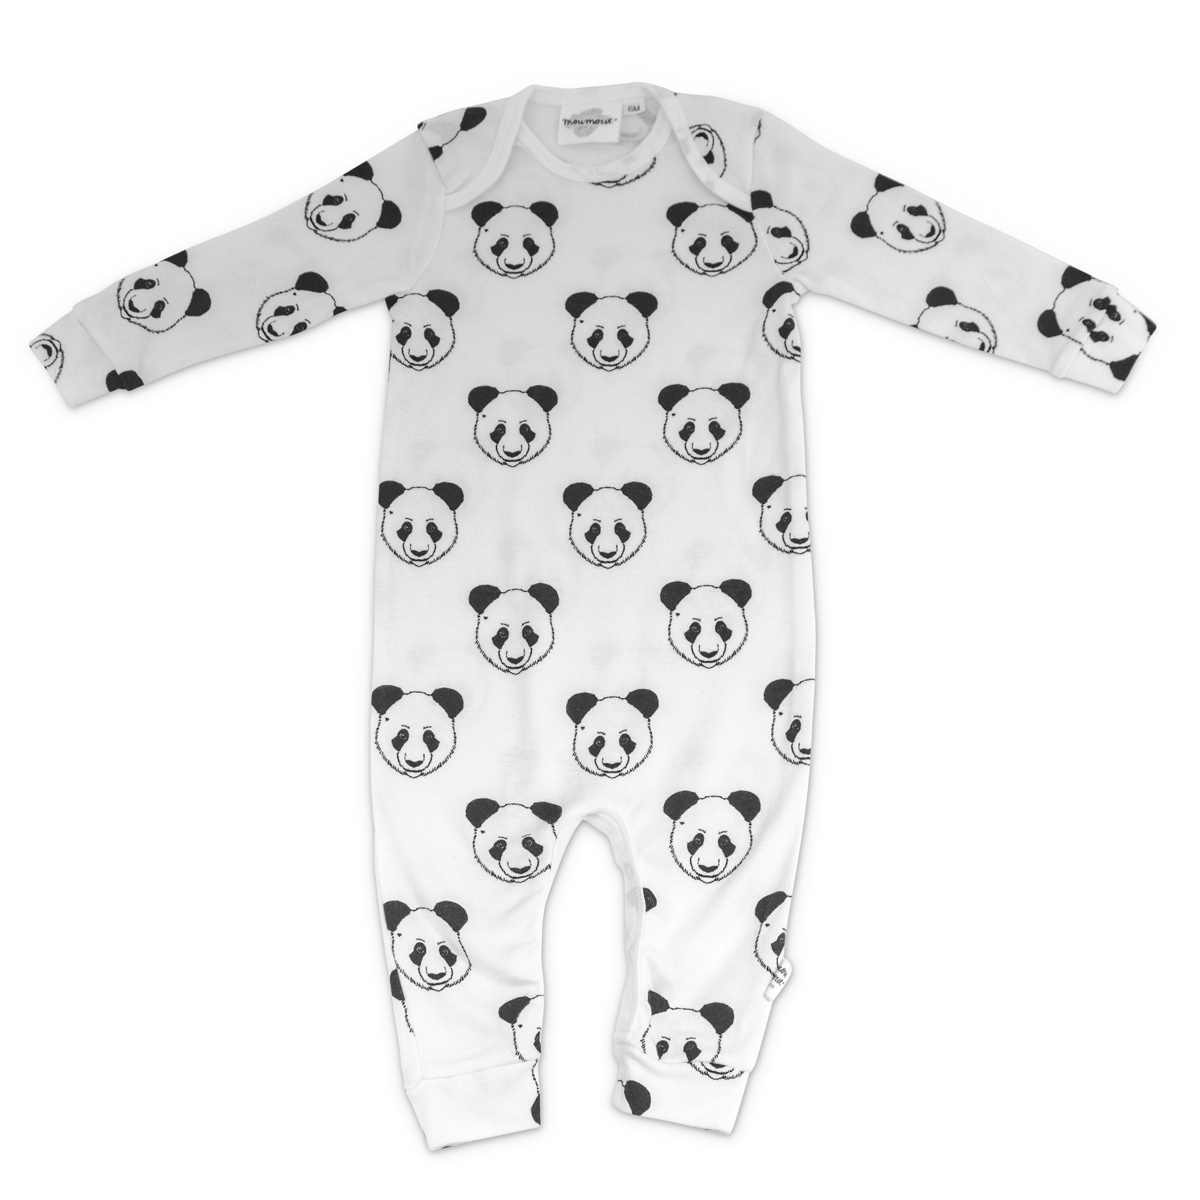 Body et Pyjama Pyjama Bobo Sans Pieds Panda - 6 Mois Pyjama Bobo Sans Pieds Panda - 6 Mois